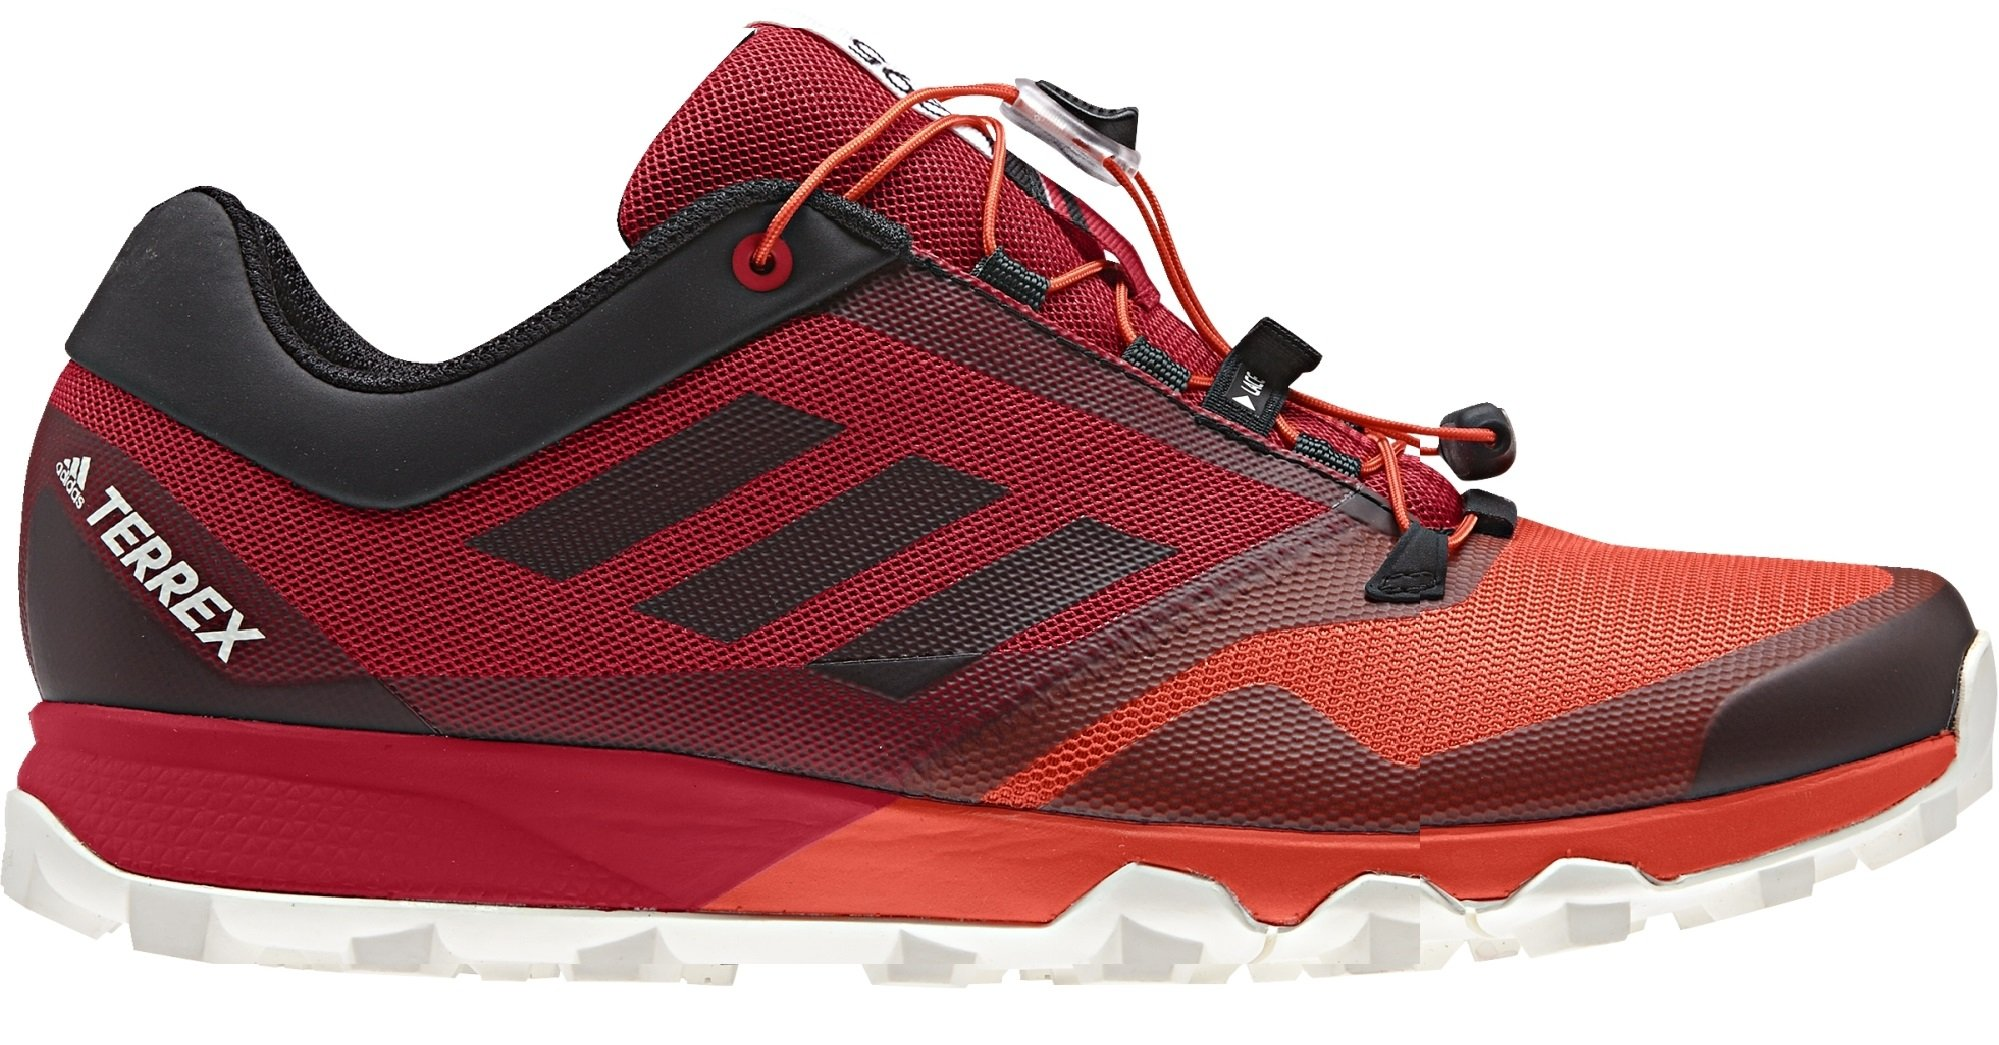 Adidas Terrex Trail Maker - Sportby e6d24cb06af